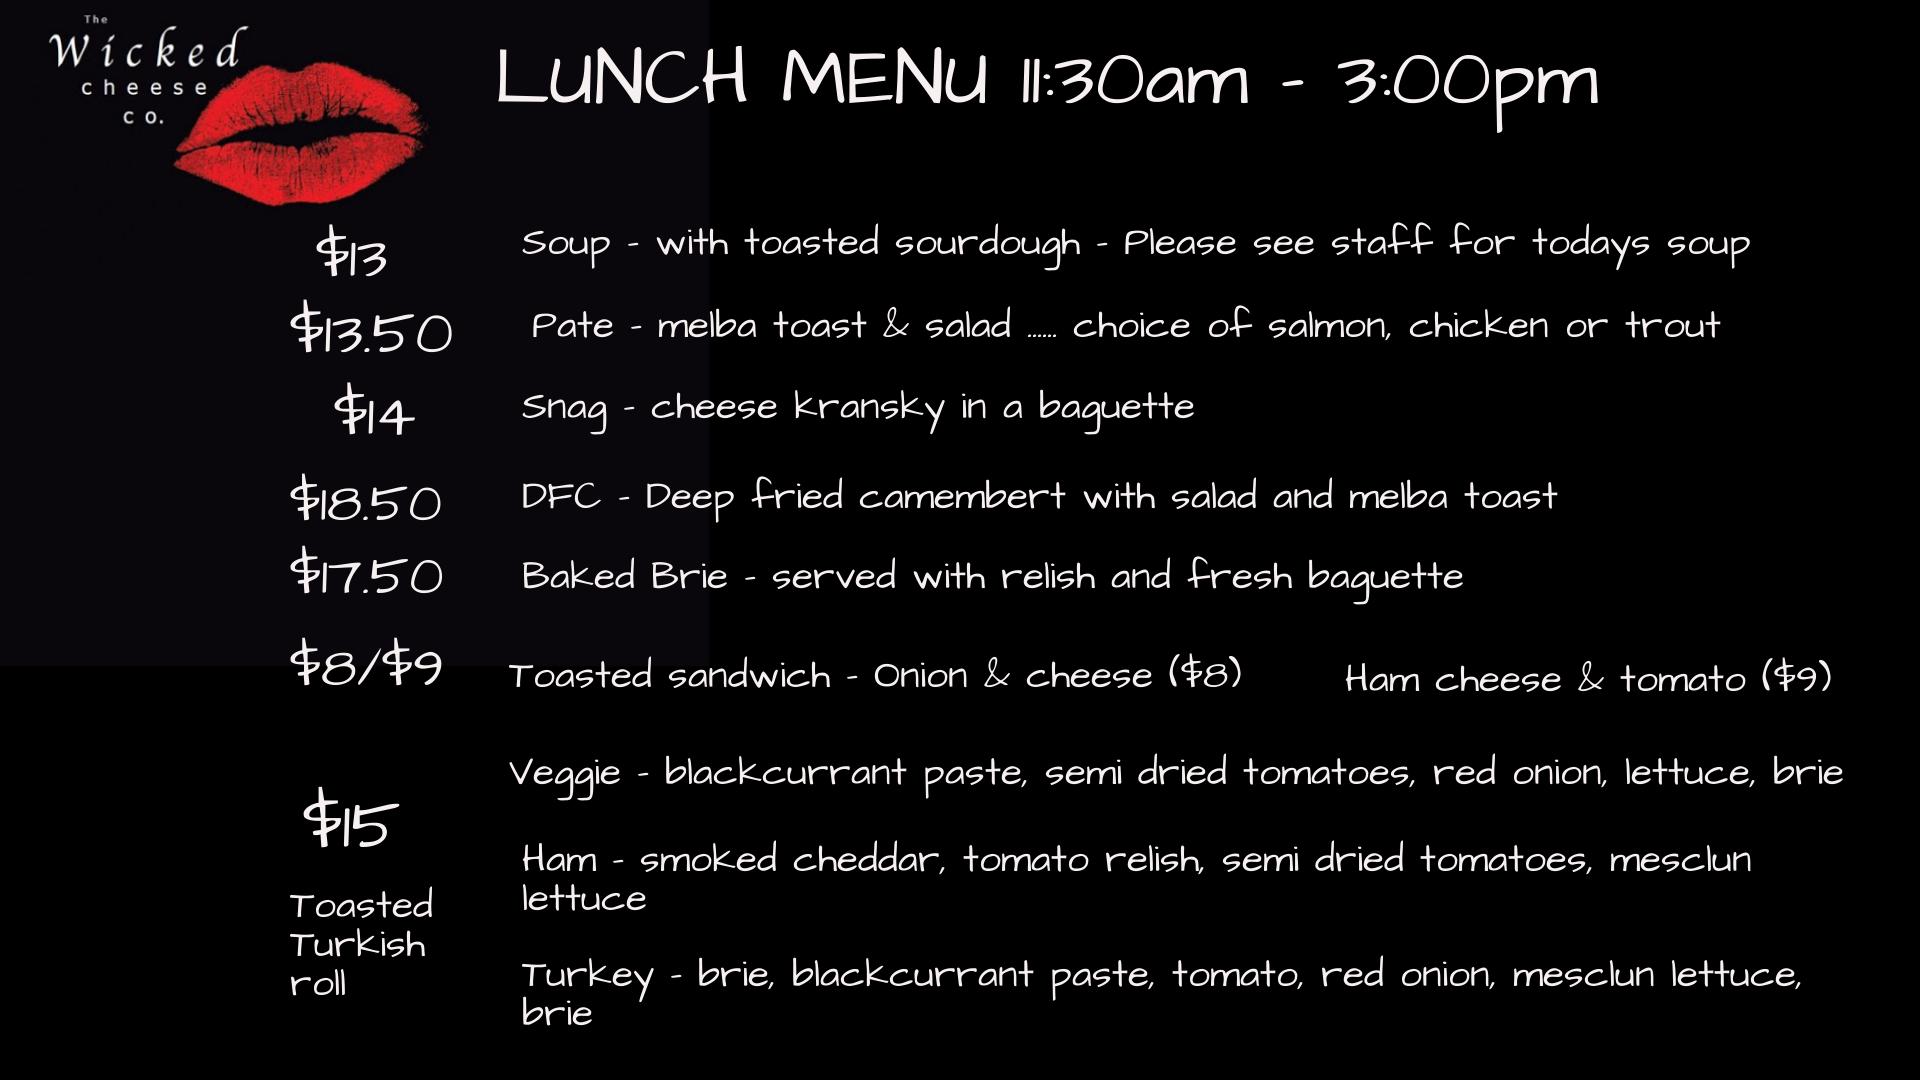 lunch-menu-1-01.09.2021.png